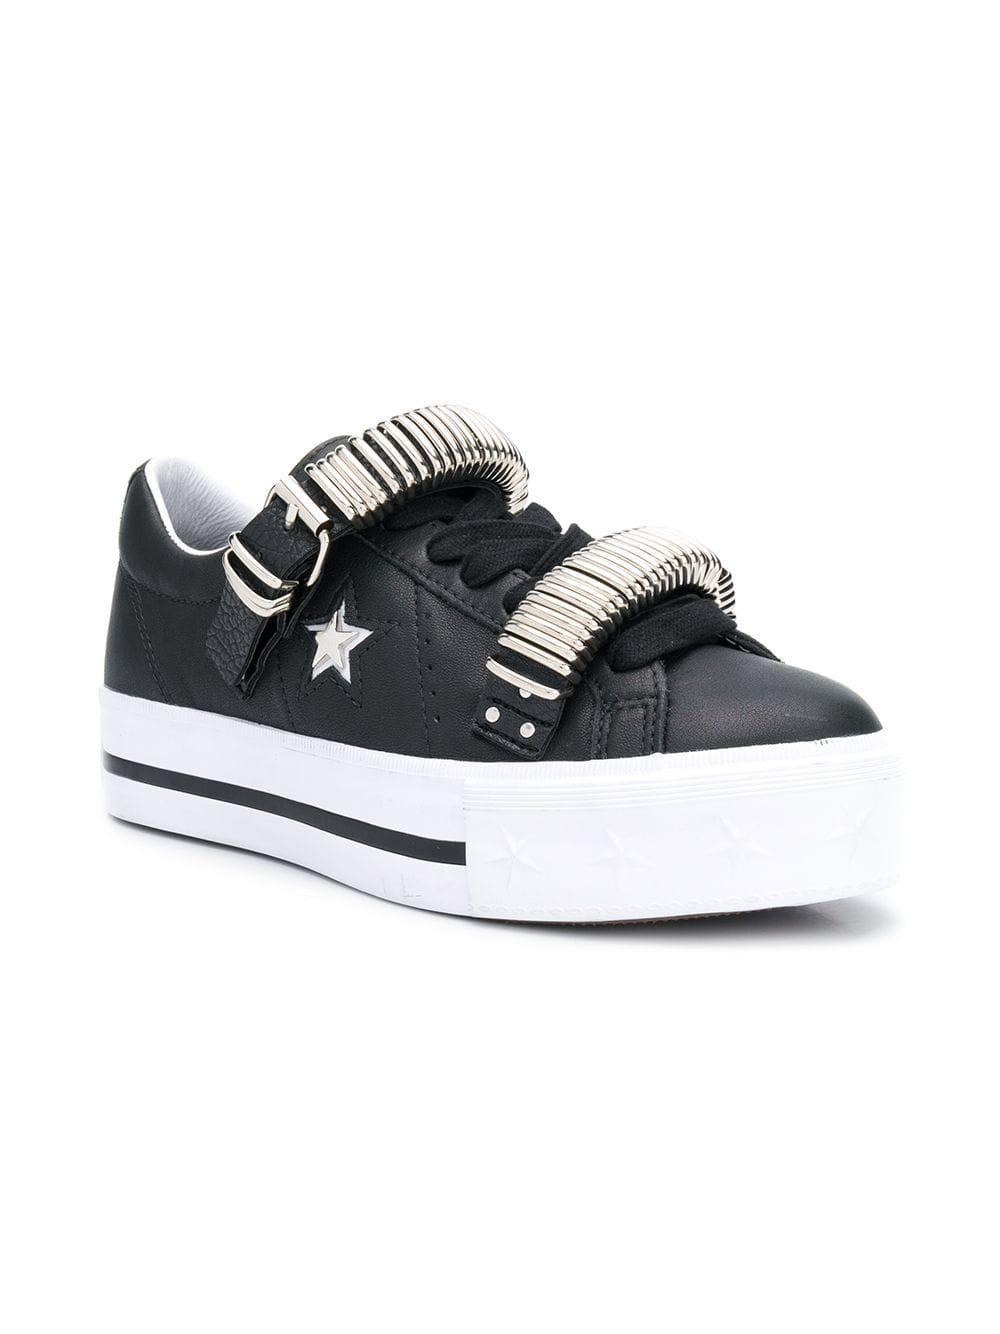 482ba08cb39849 Converse - Black One Star Platform Sneakers - Lyst. View fullscreen